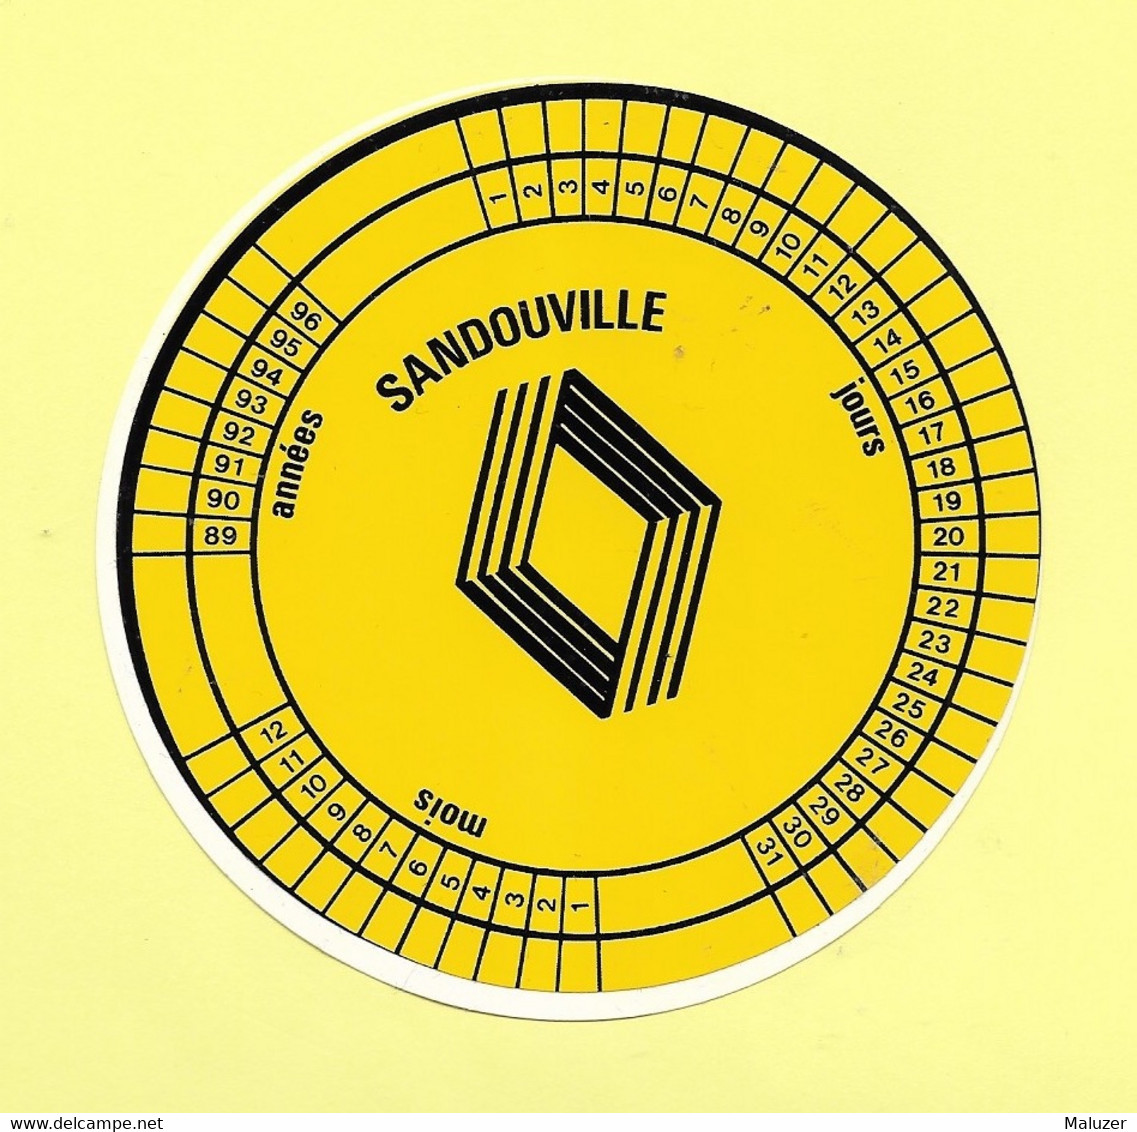 AUTOCOLLANT STICKER - RENAULT - SANDOUVILLE - SEINE-MARITIME - NORMANDIE - AUTOMOBILE - Stickers